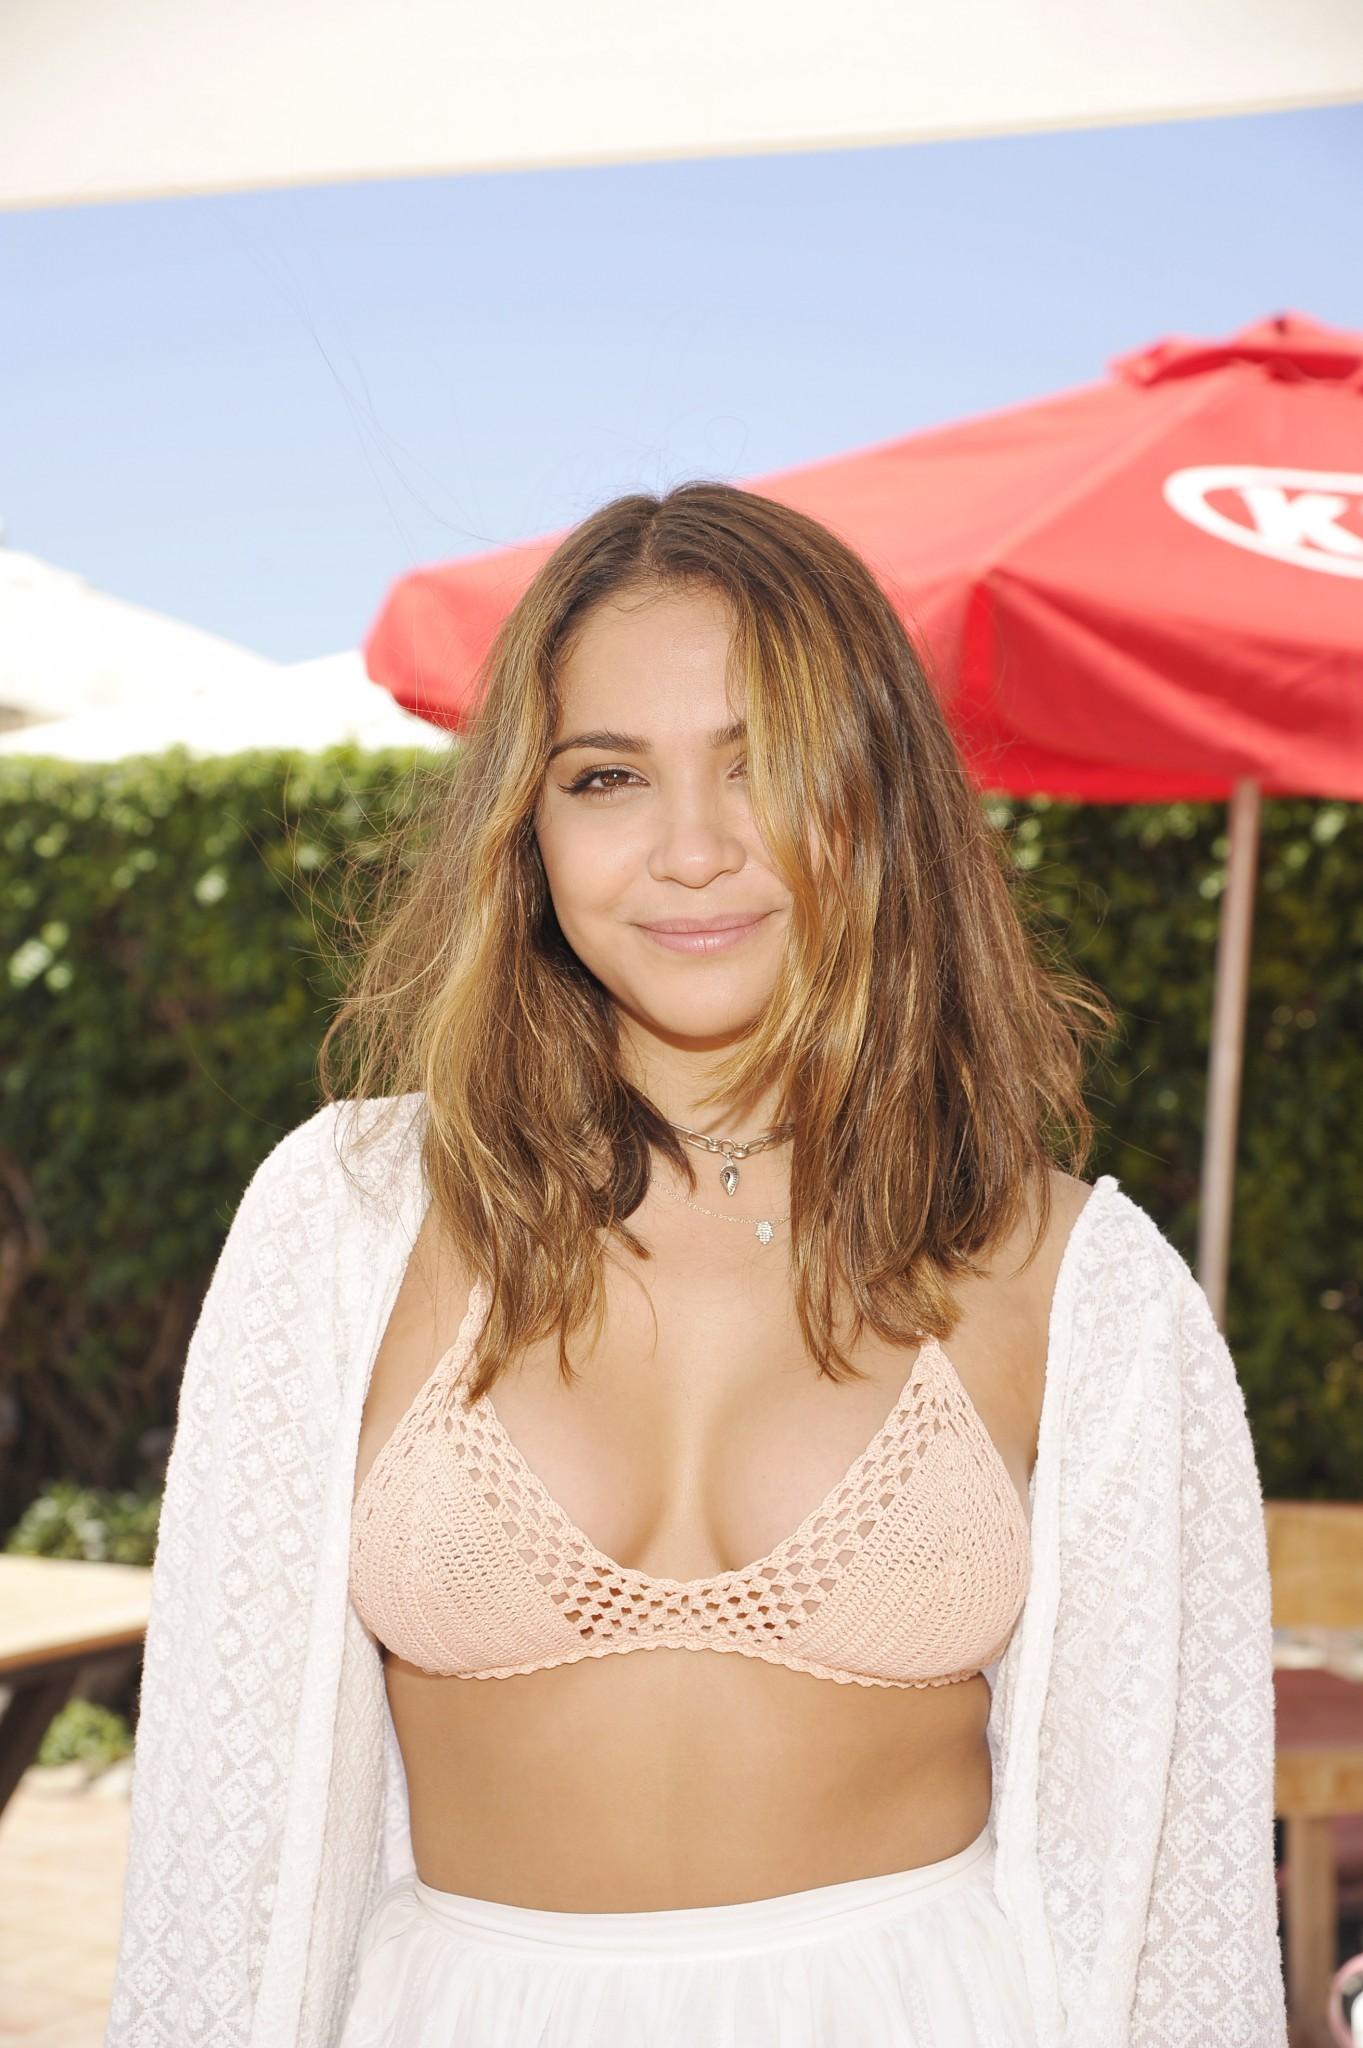 stella-hudgens-cleavage-bikini-top-02